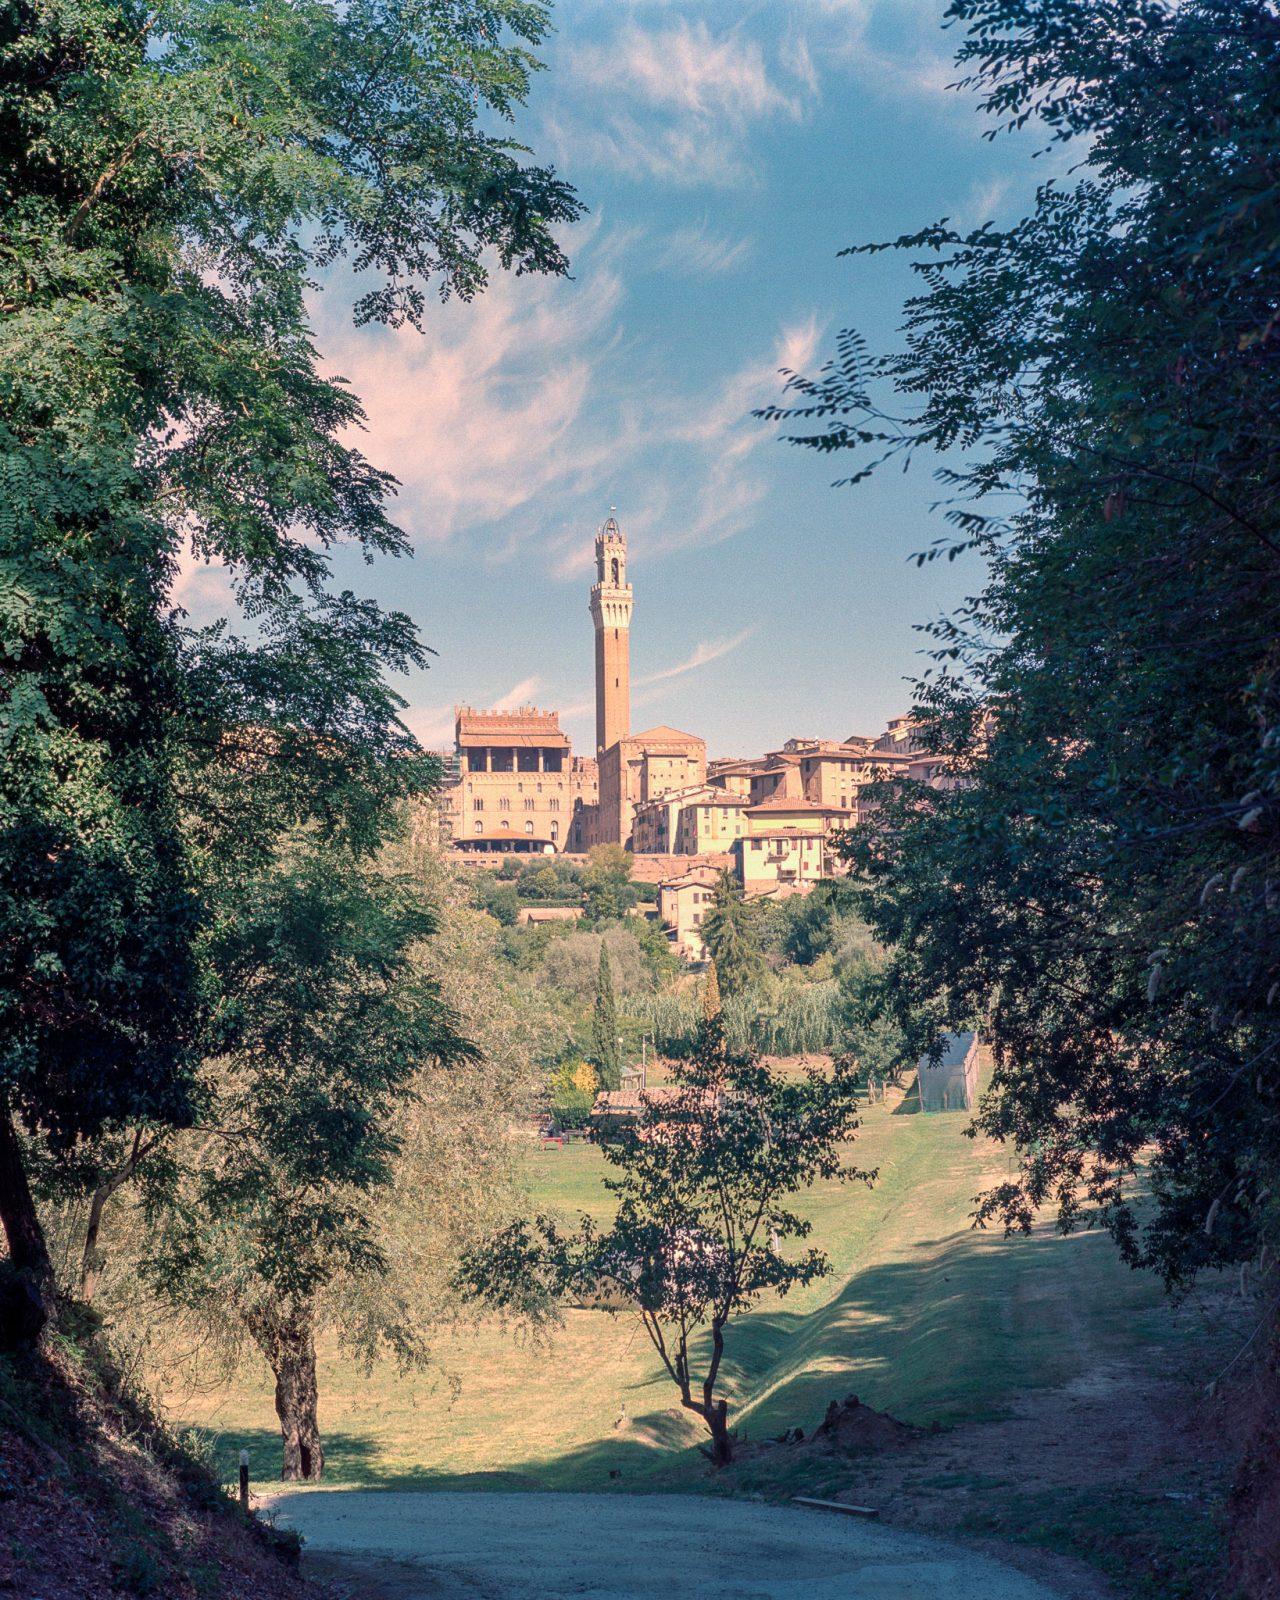 Orto de' Pecci, Siena, Tuscany, Italy